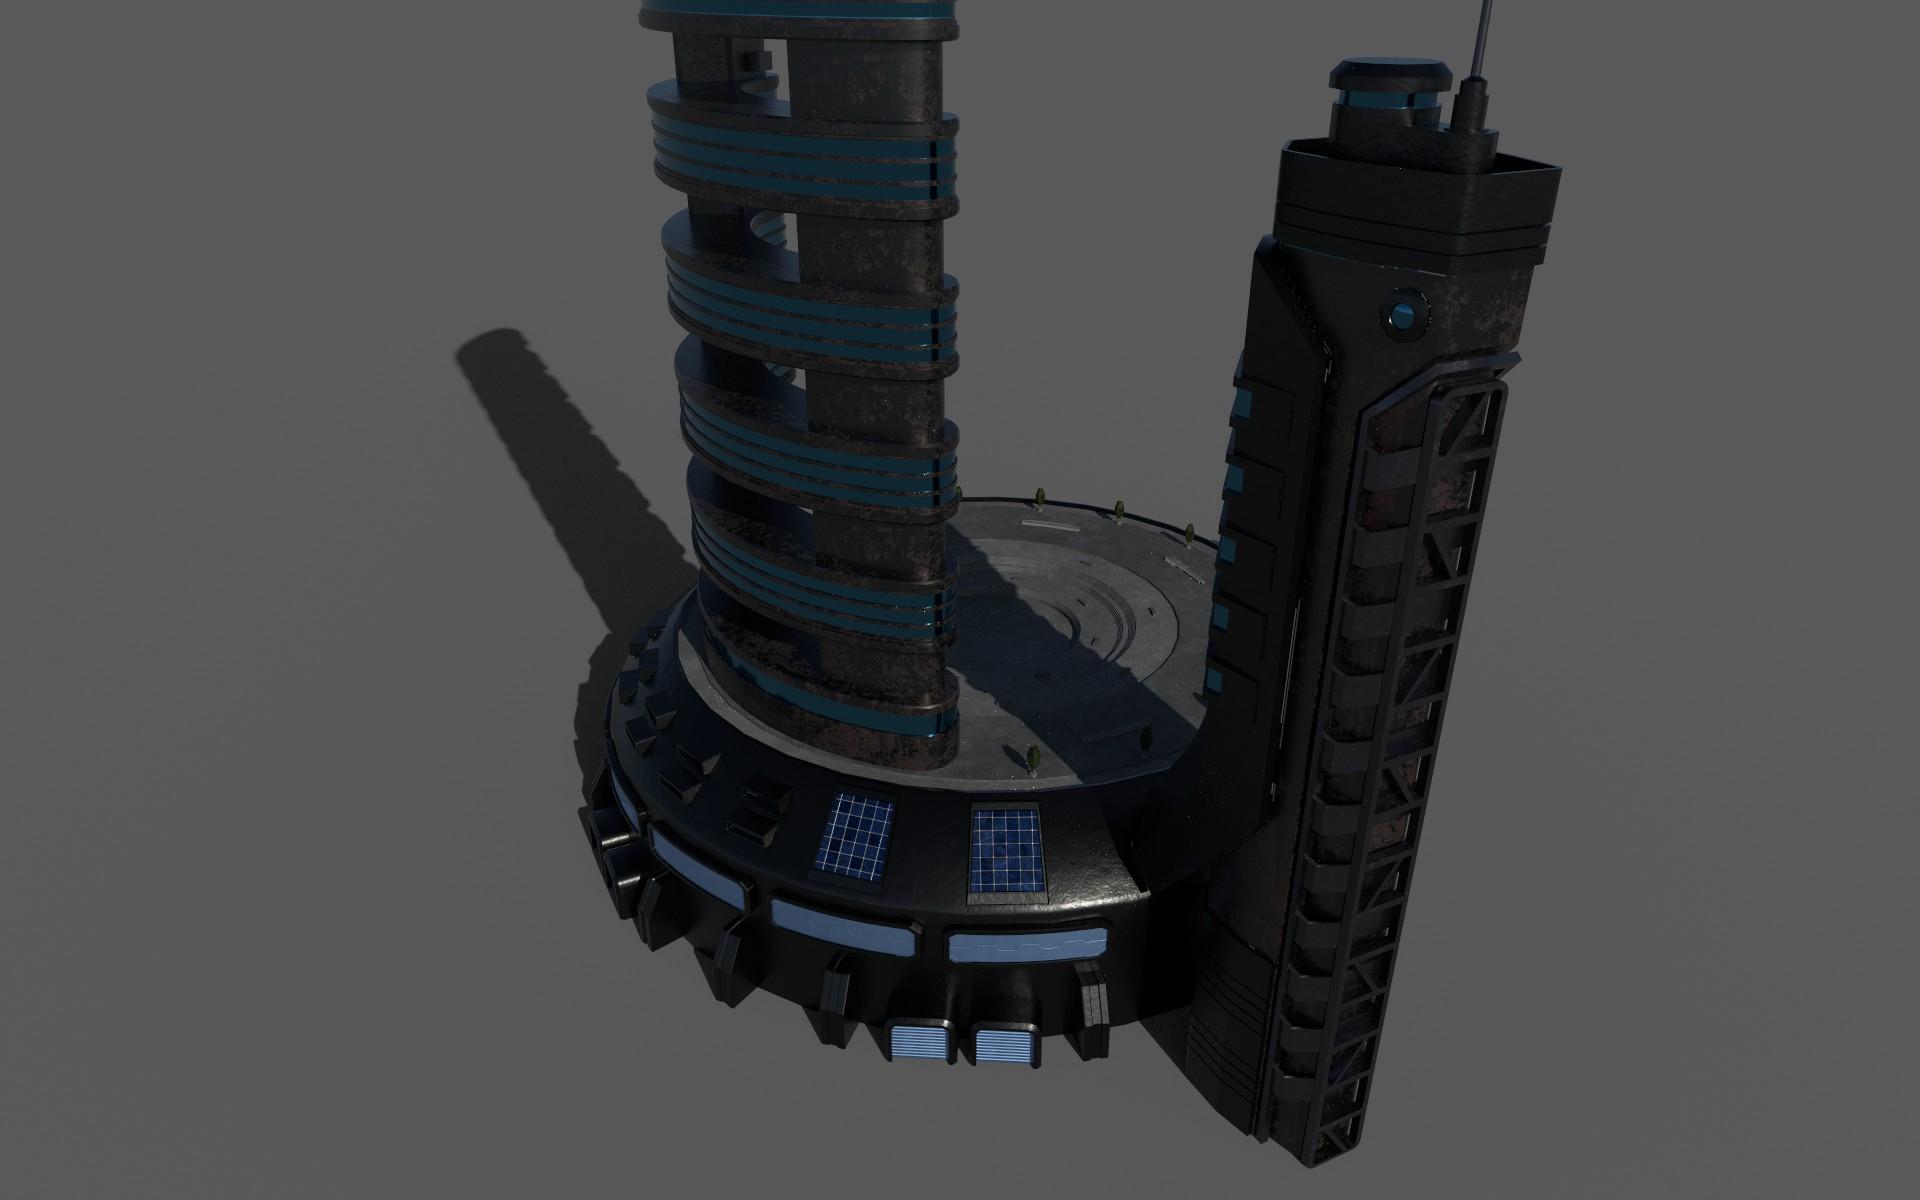 sci-fi hotel 3d model 3ds max fbx dae obj 272852